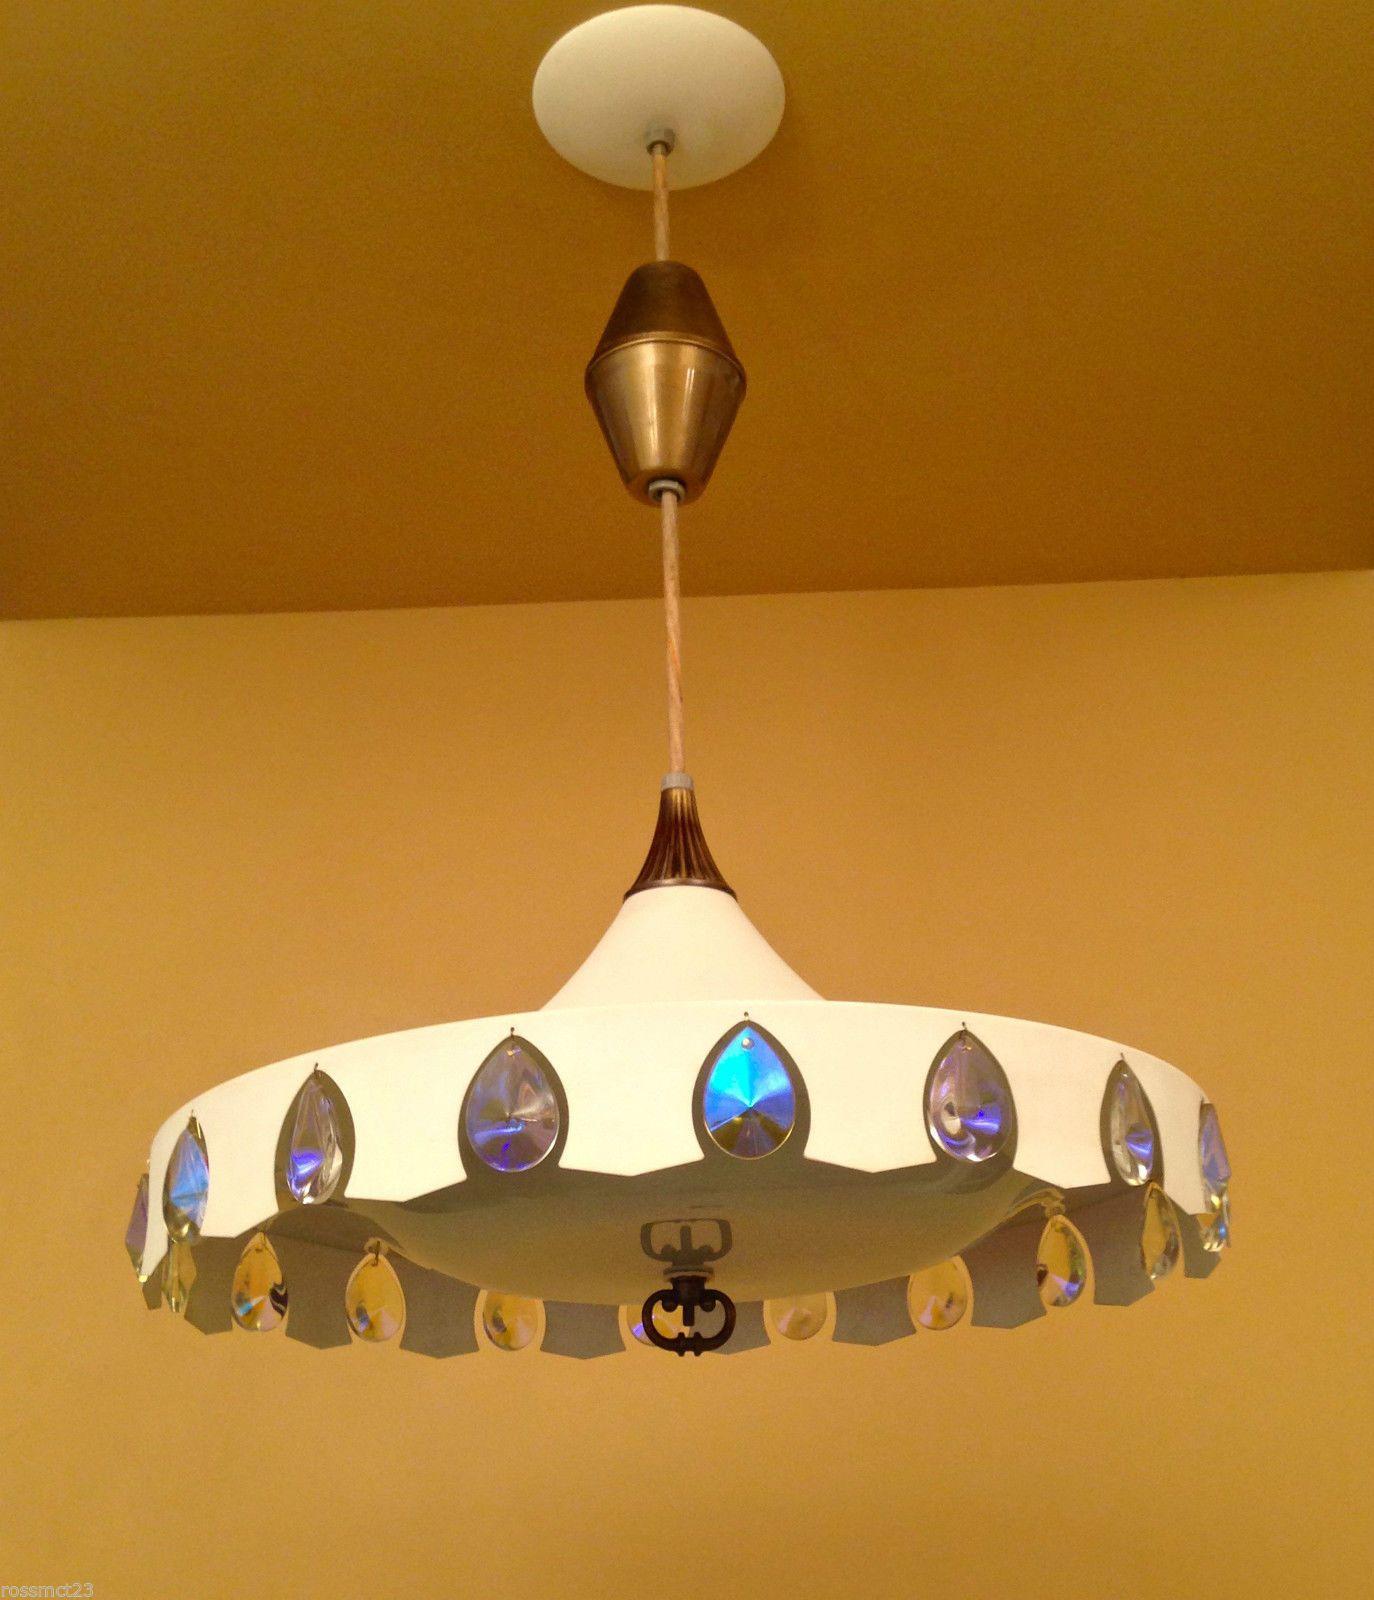 Vintage Lighting Rare 1965 Pull Down Crystal Pendant By Moe Ebay Vintage Lighting Antique Lighting Mid Century Lamp